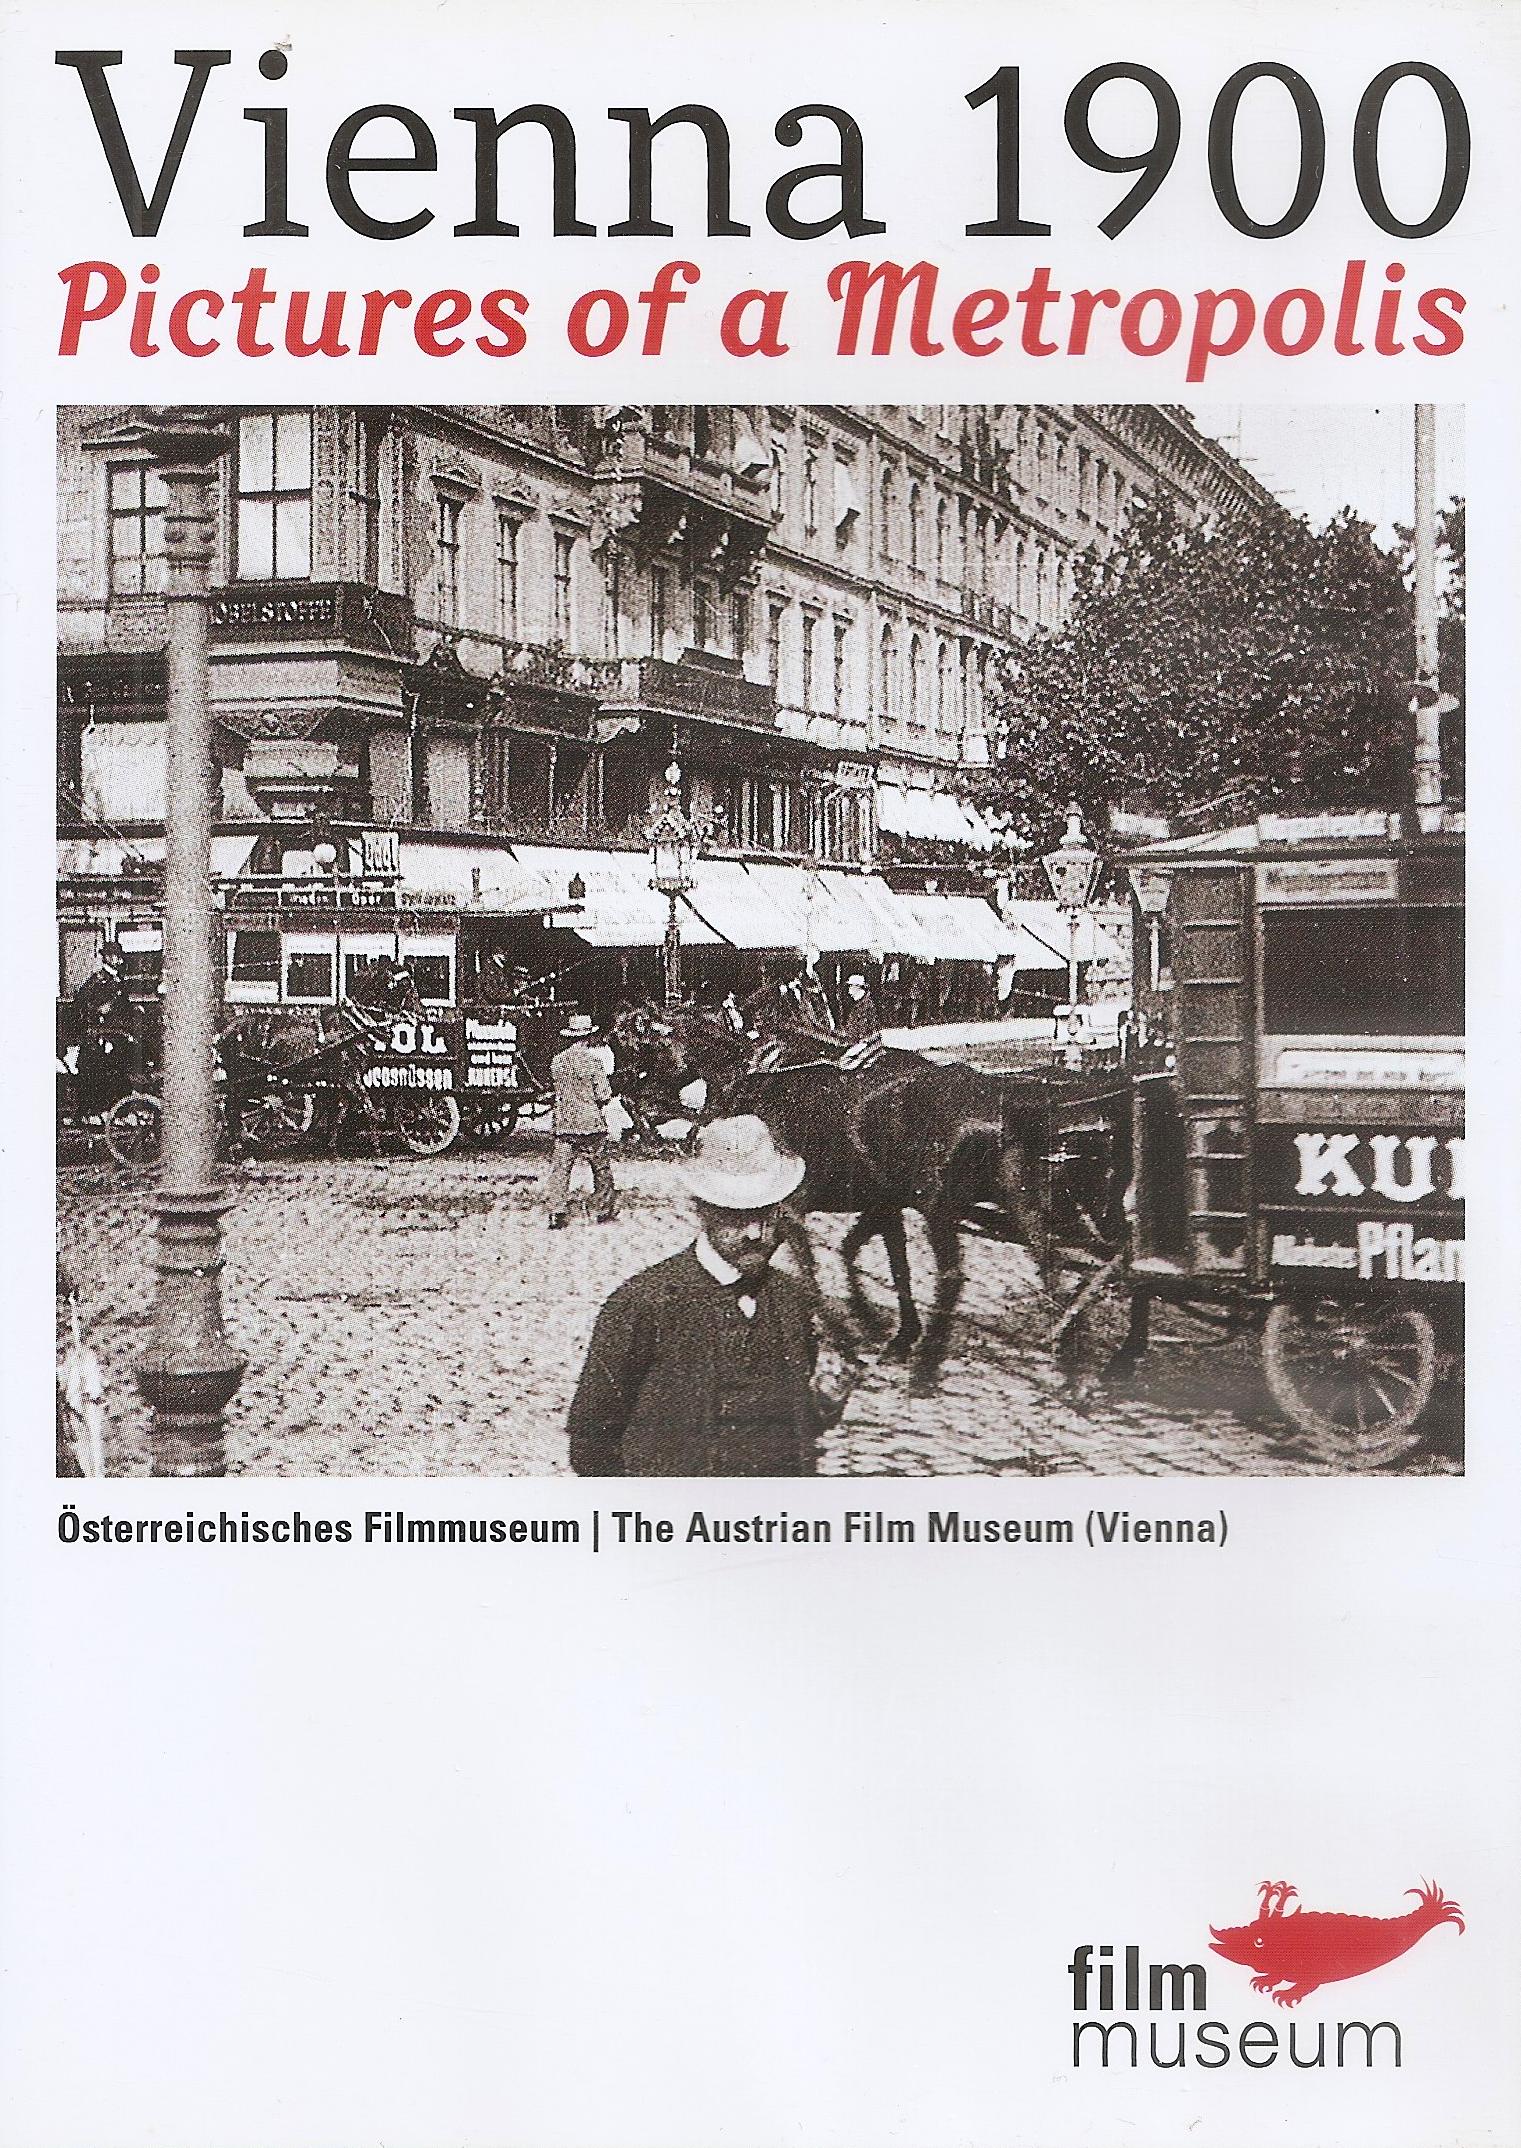 Vienna 1900 300.png